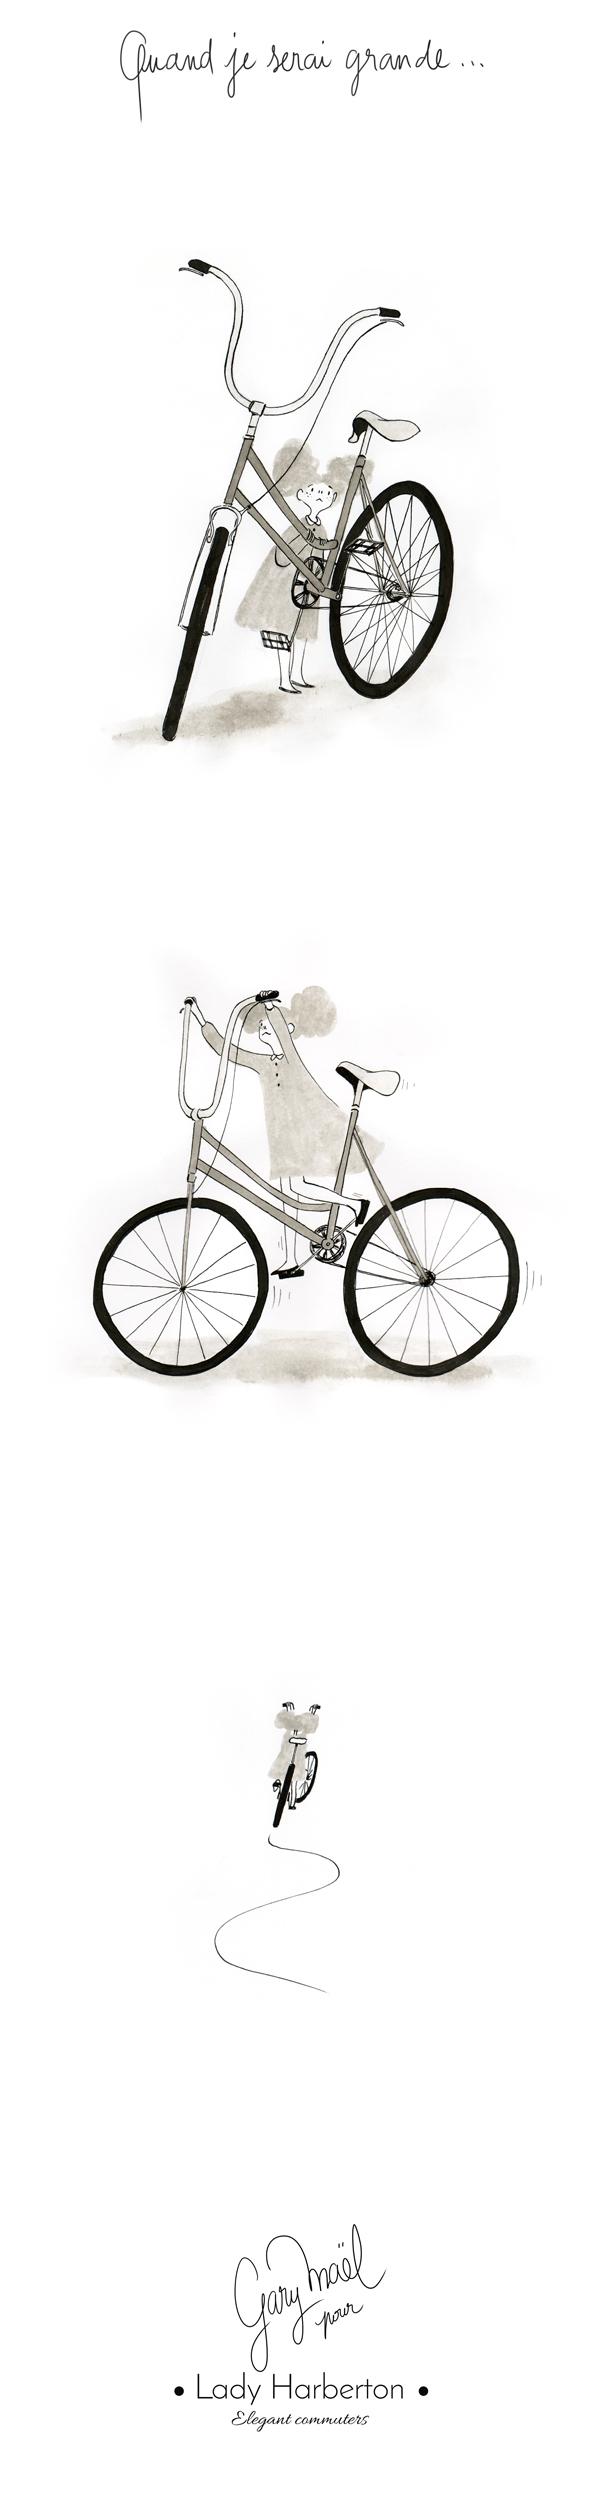 grown-up Cycle stories 1 Gary Maël